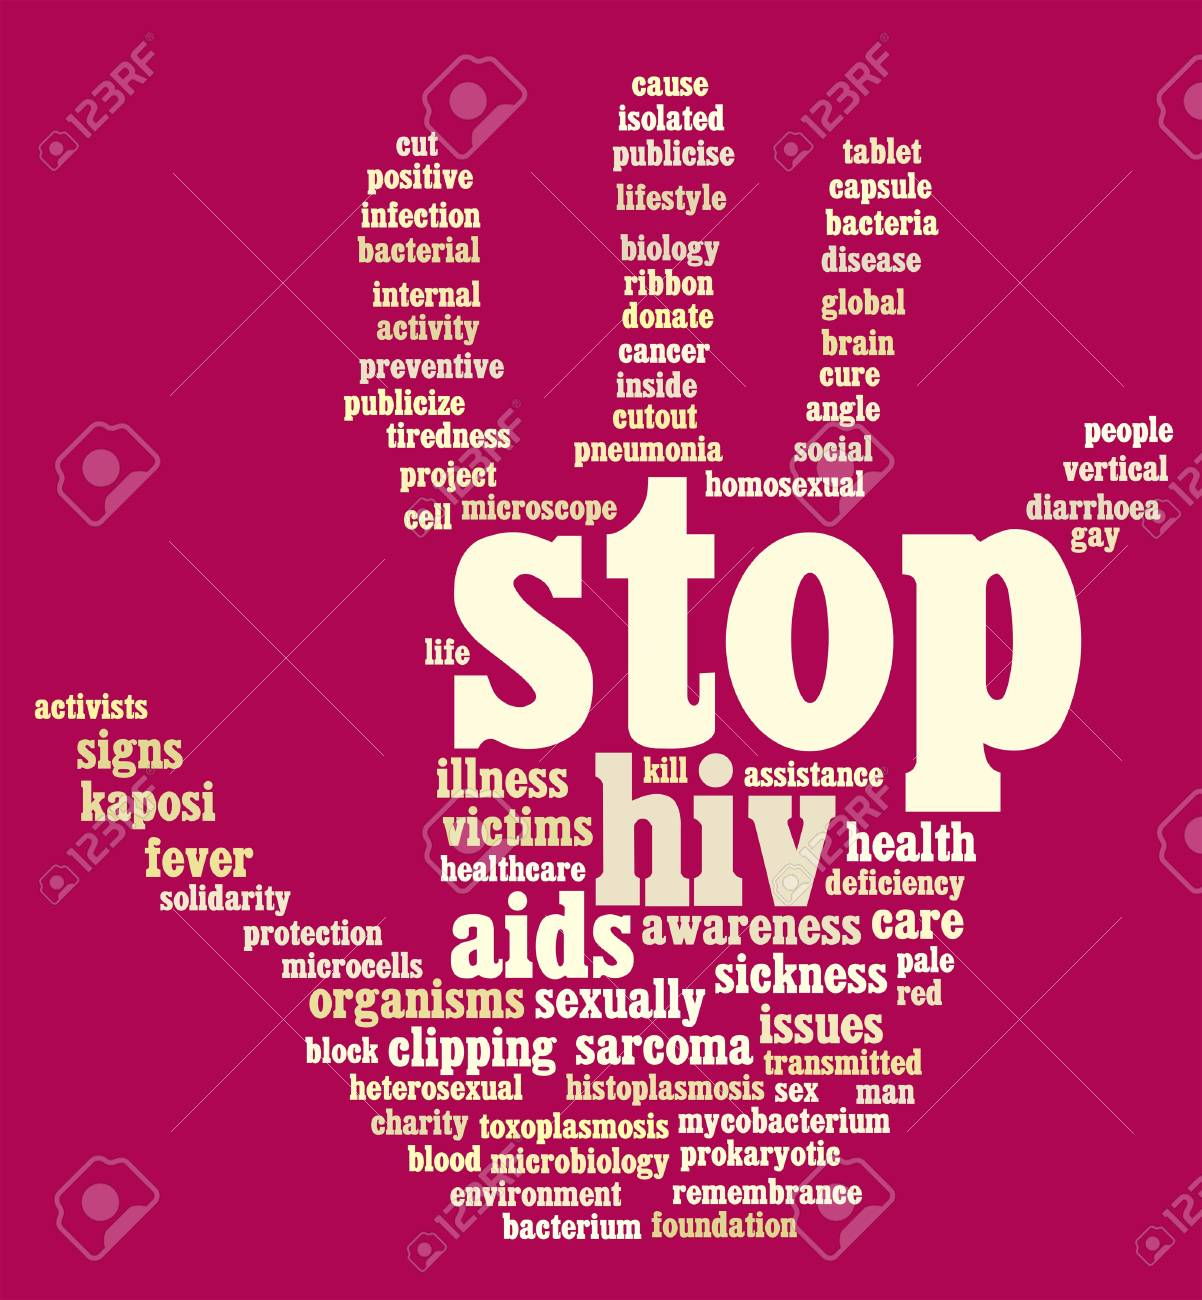 HIV AIDS info-text graphics and arrangement hand symbol concept Stock Photo - 15875090